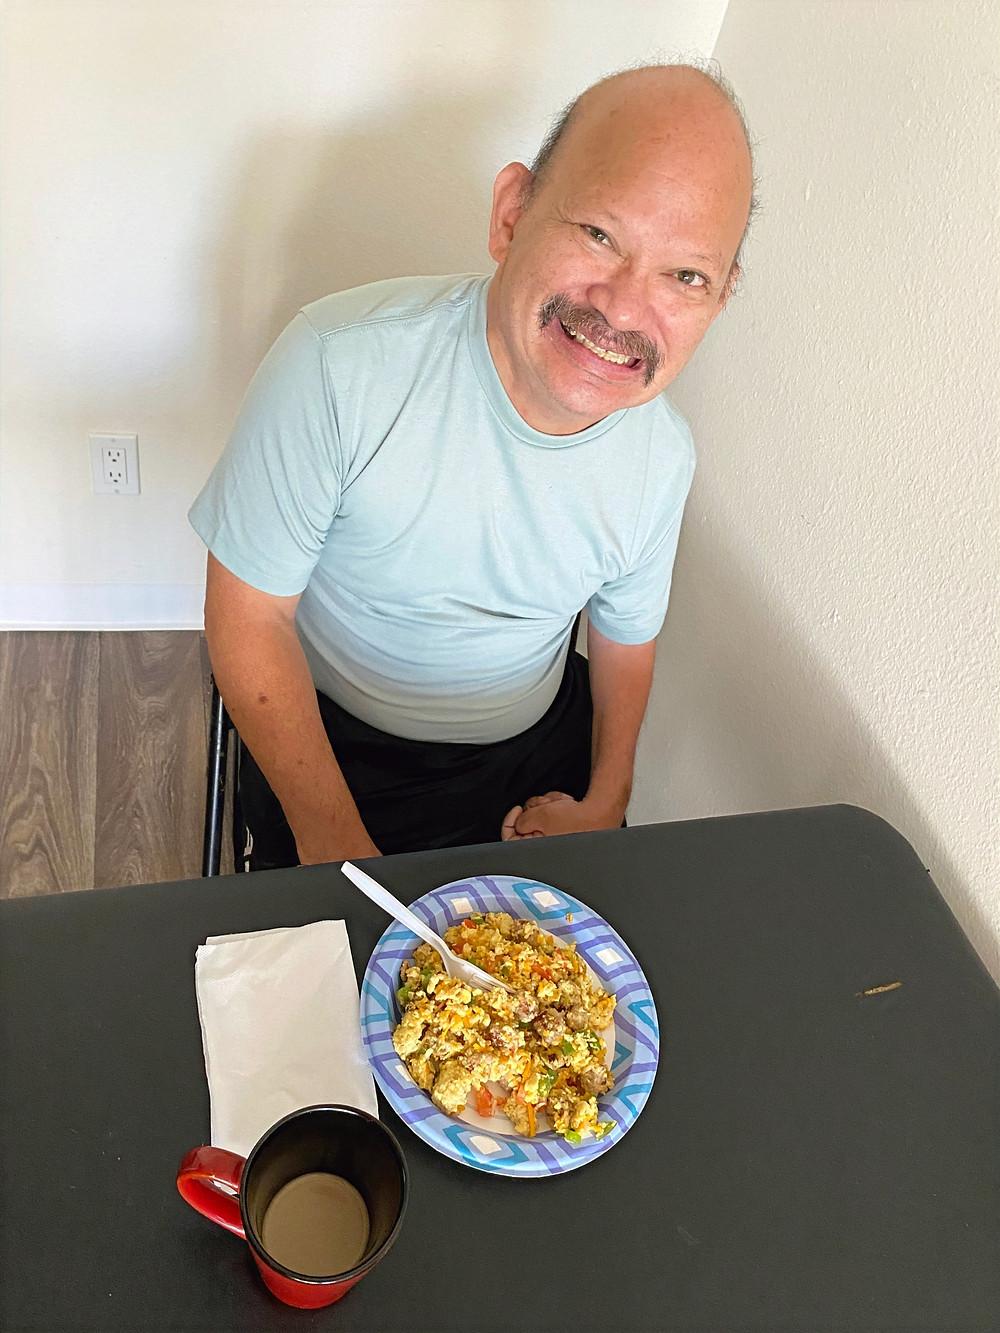 David happily preparing to enjoy his delicious meal